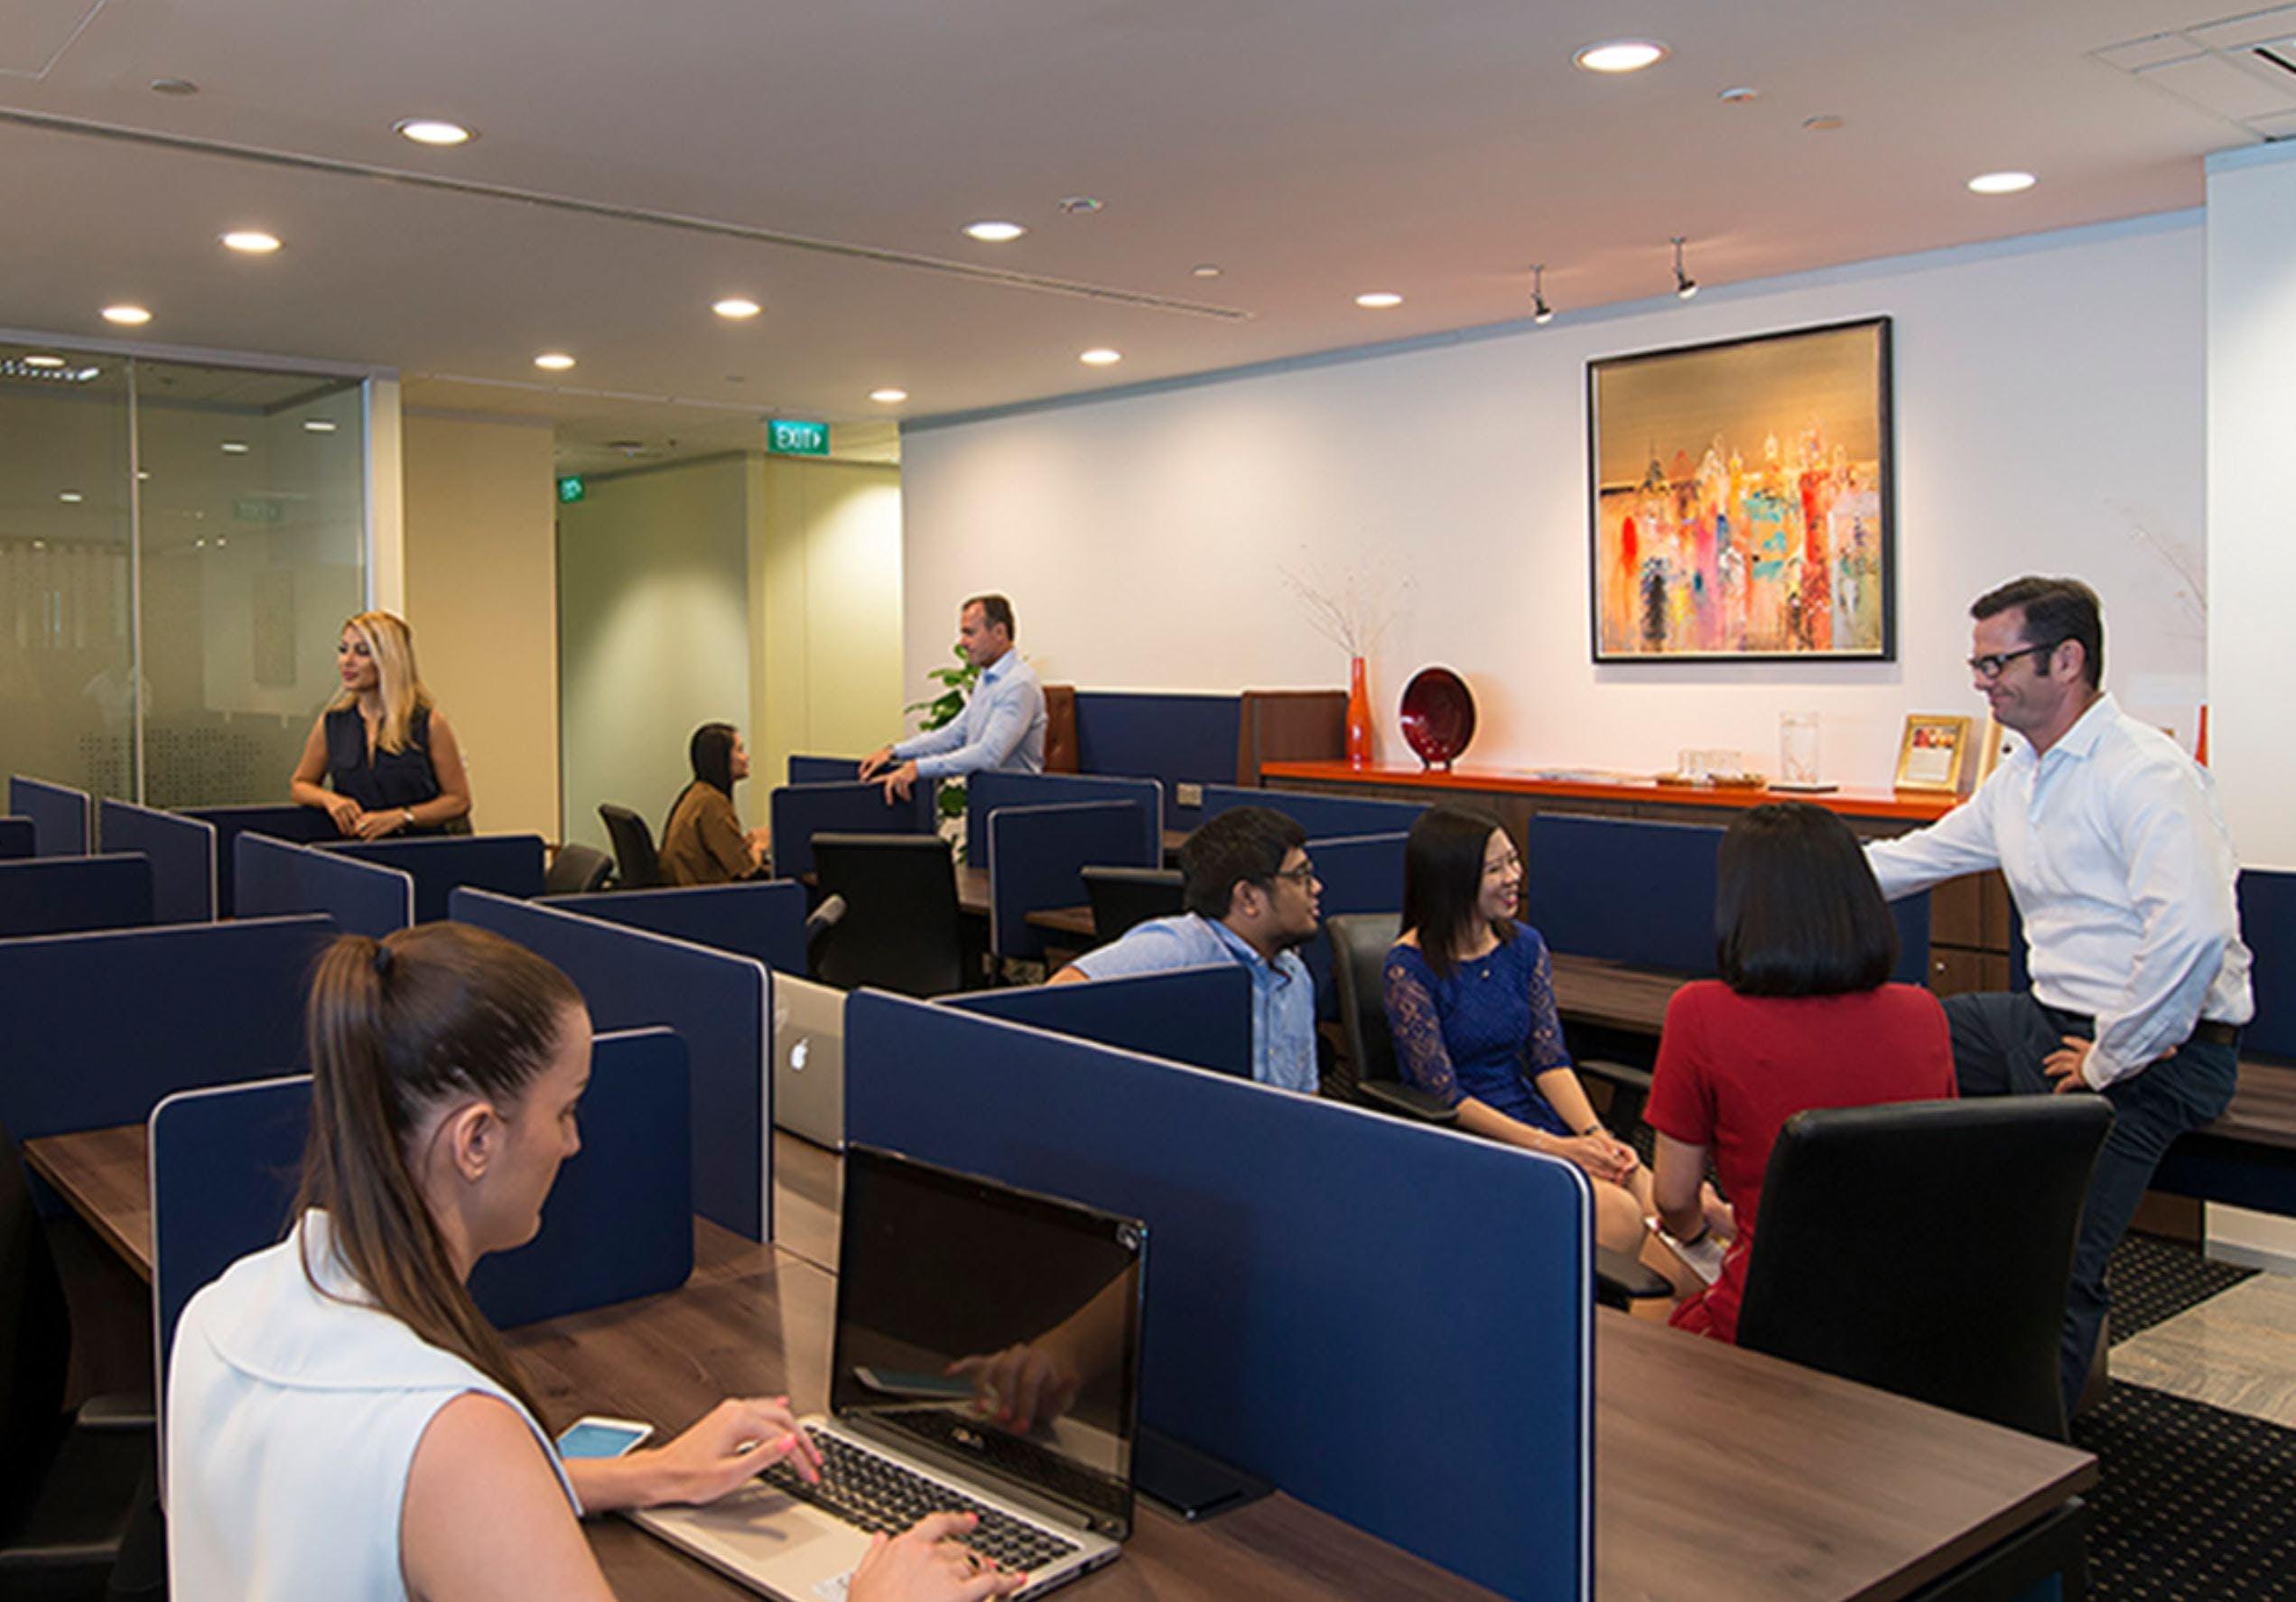 Dedicated desk at Deloitte Building, image 1